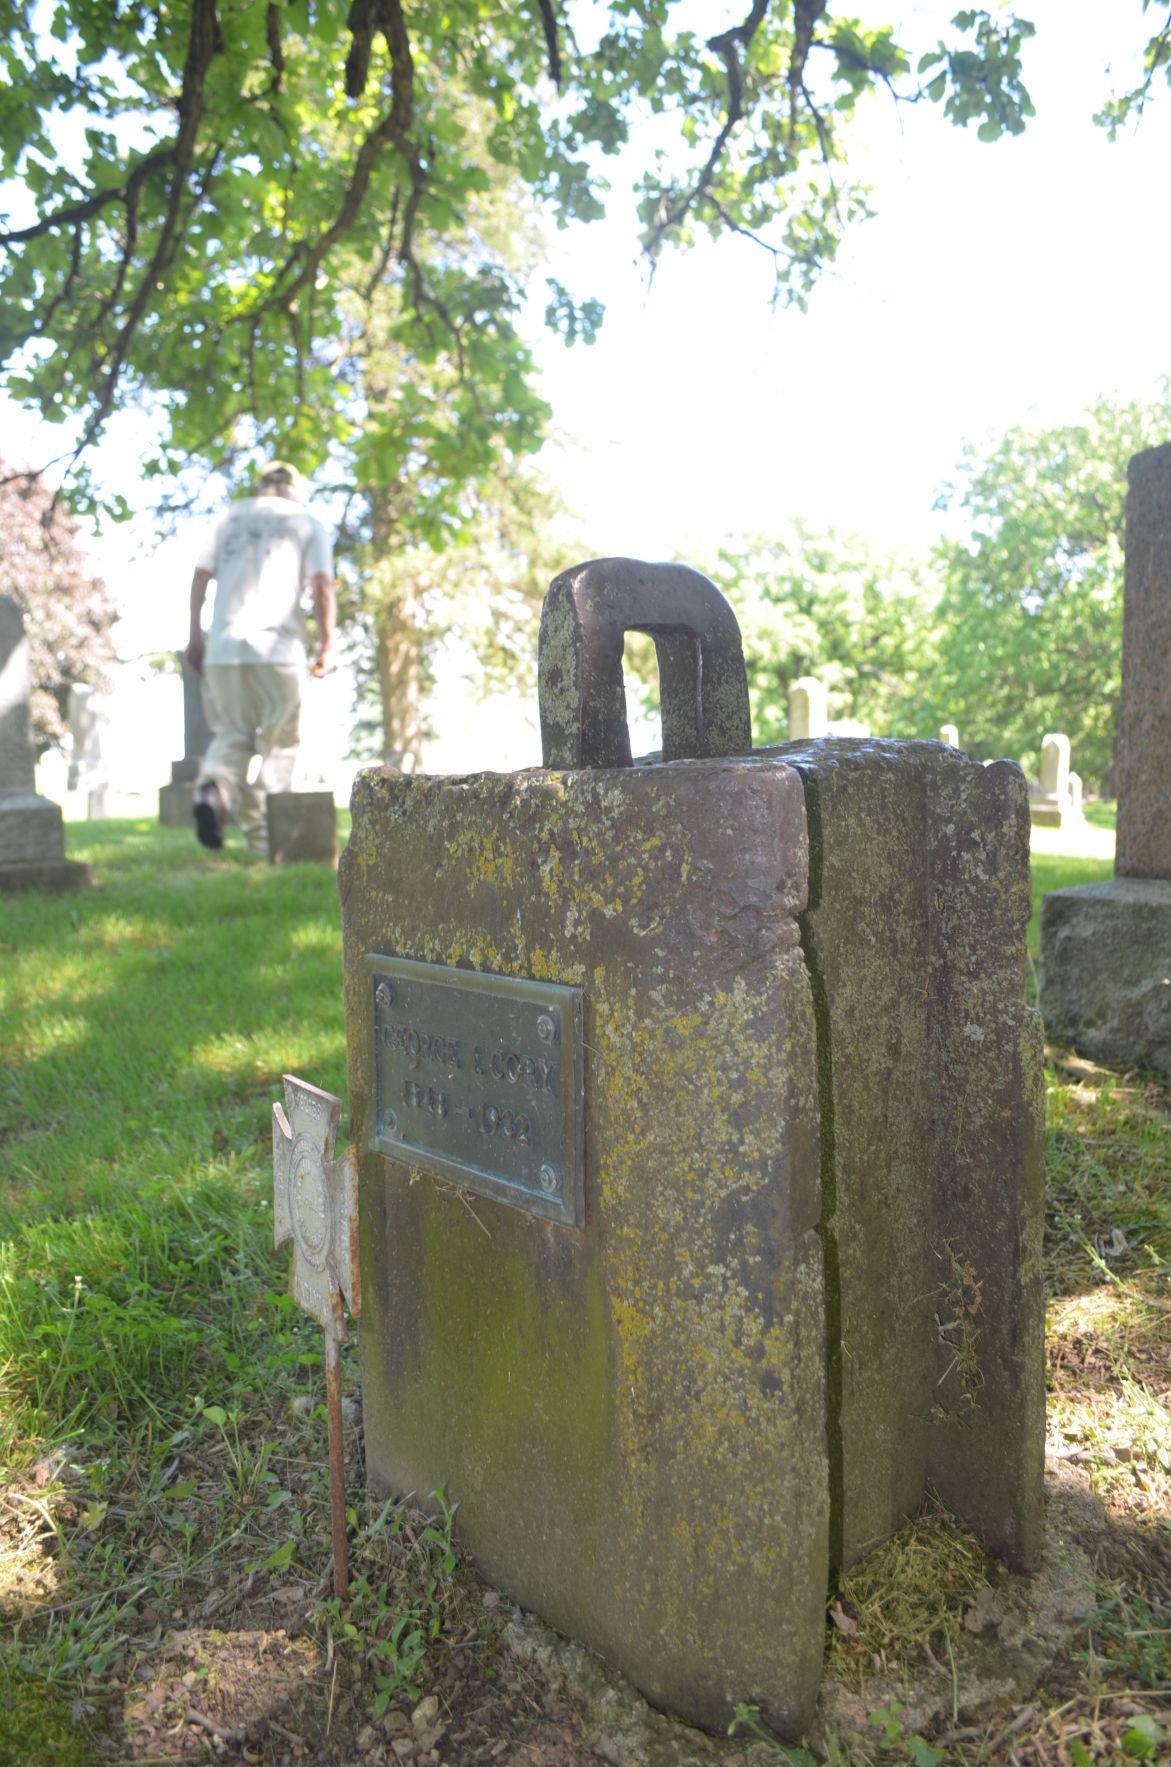 Sac City Iowa Obituaries